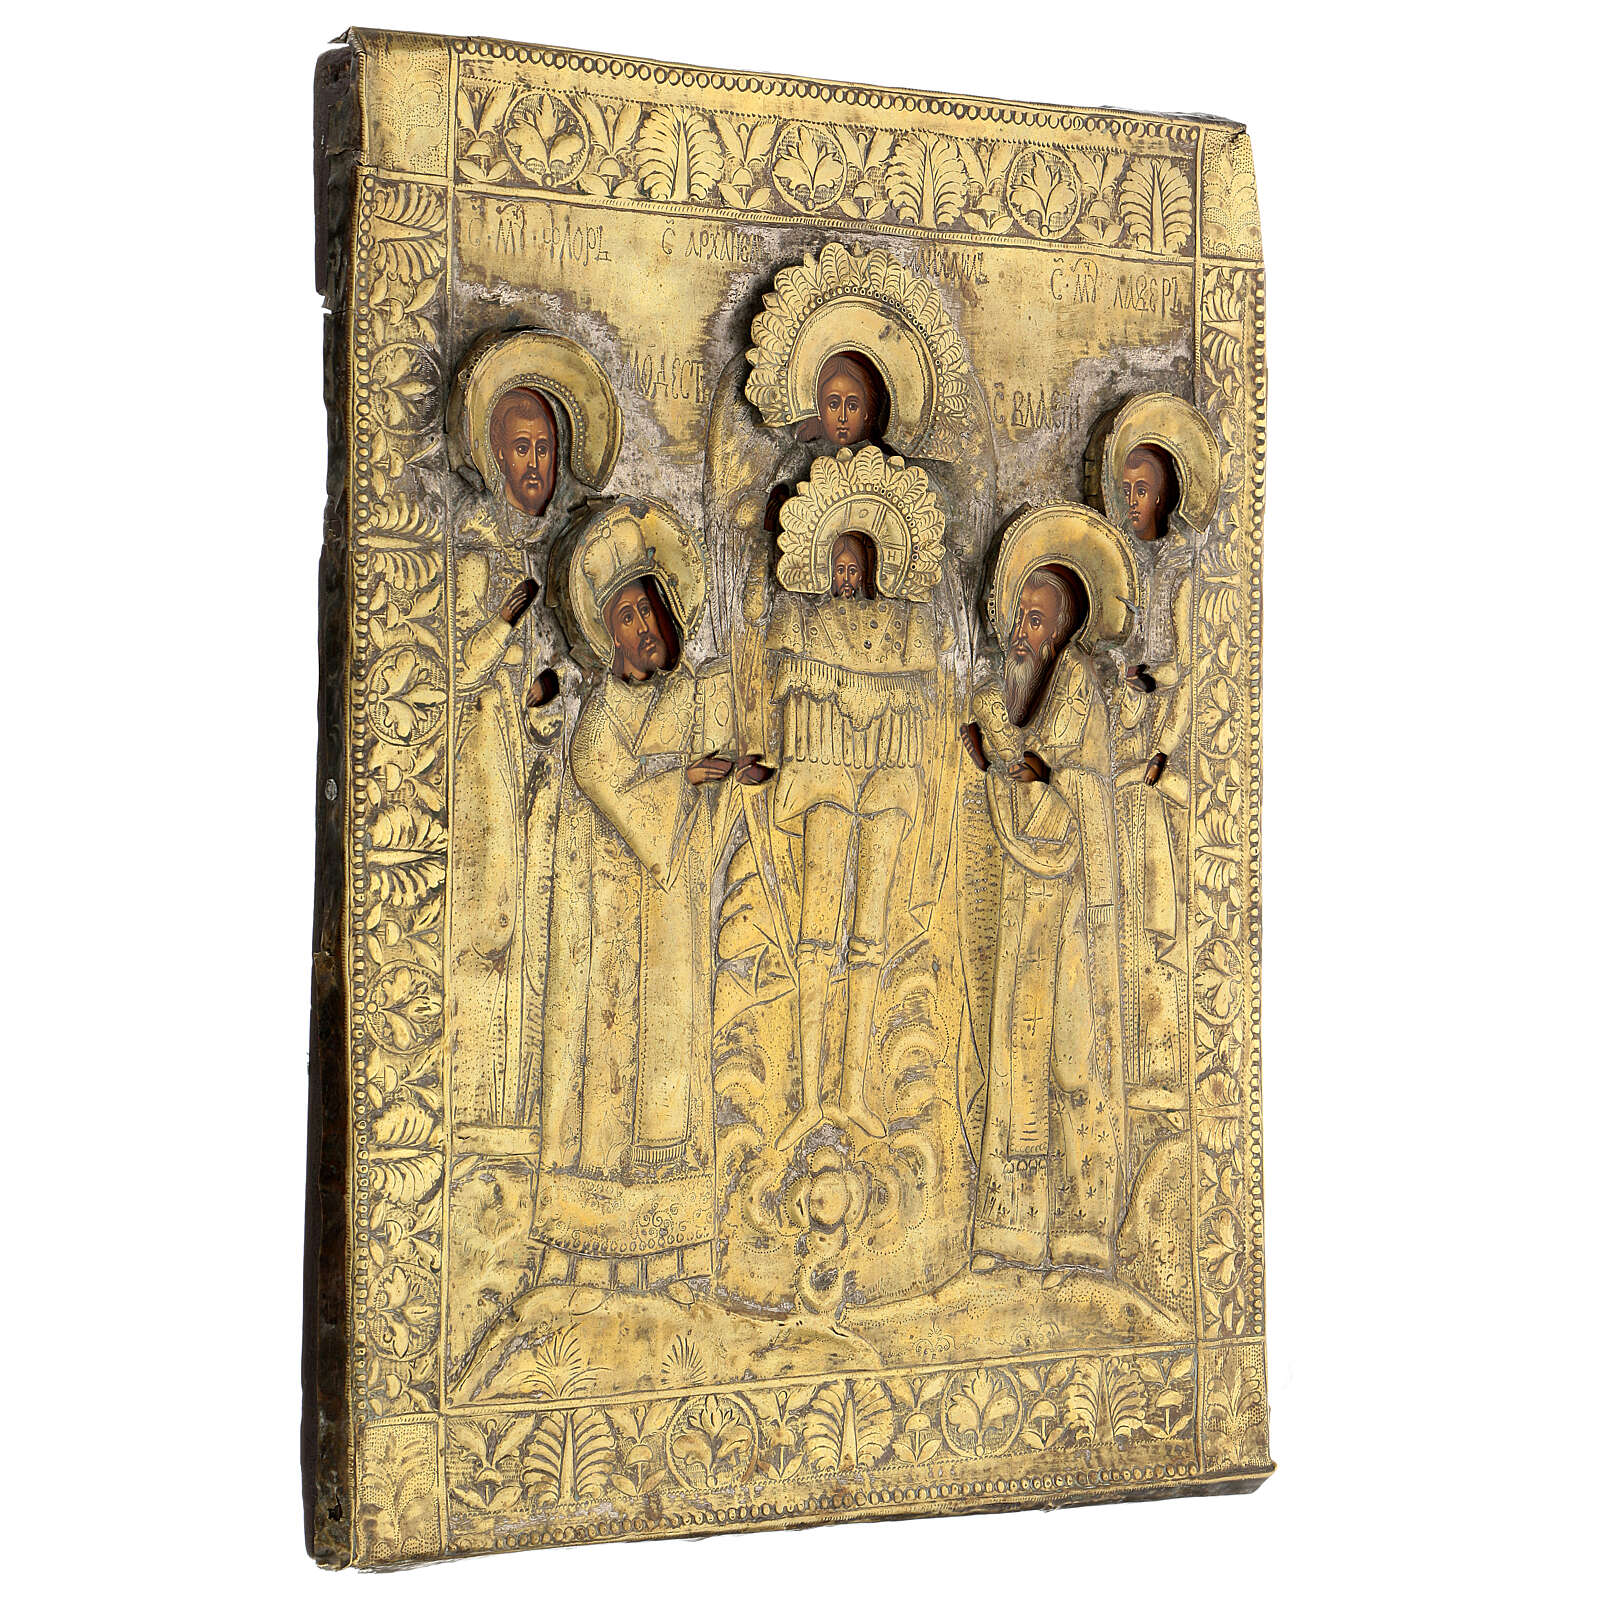 Icona russa tavola antica Tempio dell'Arcangelo Michele XIX sec 40x30 cm Restaurata 4